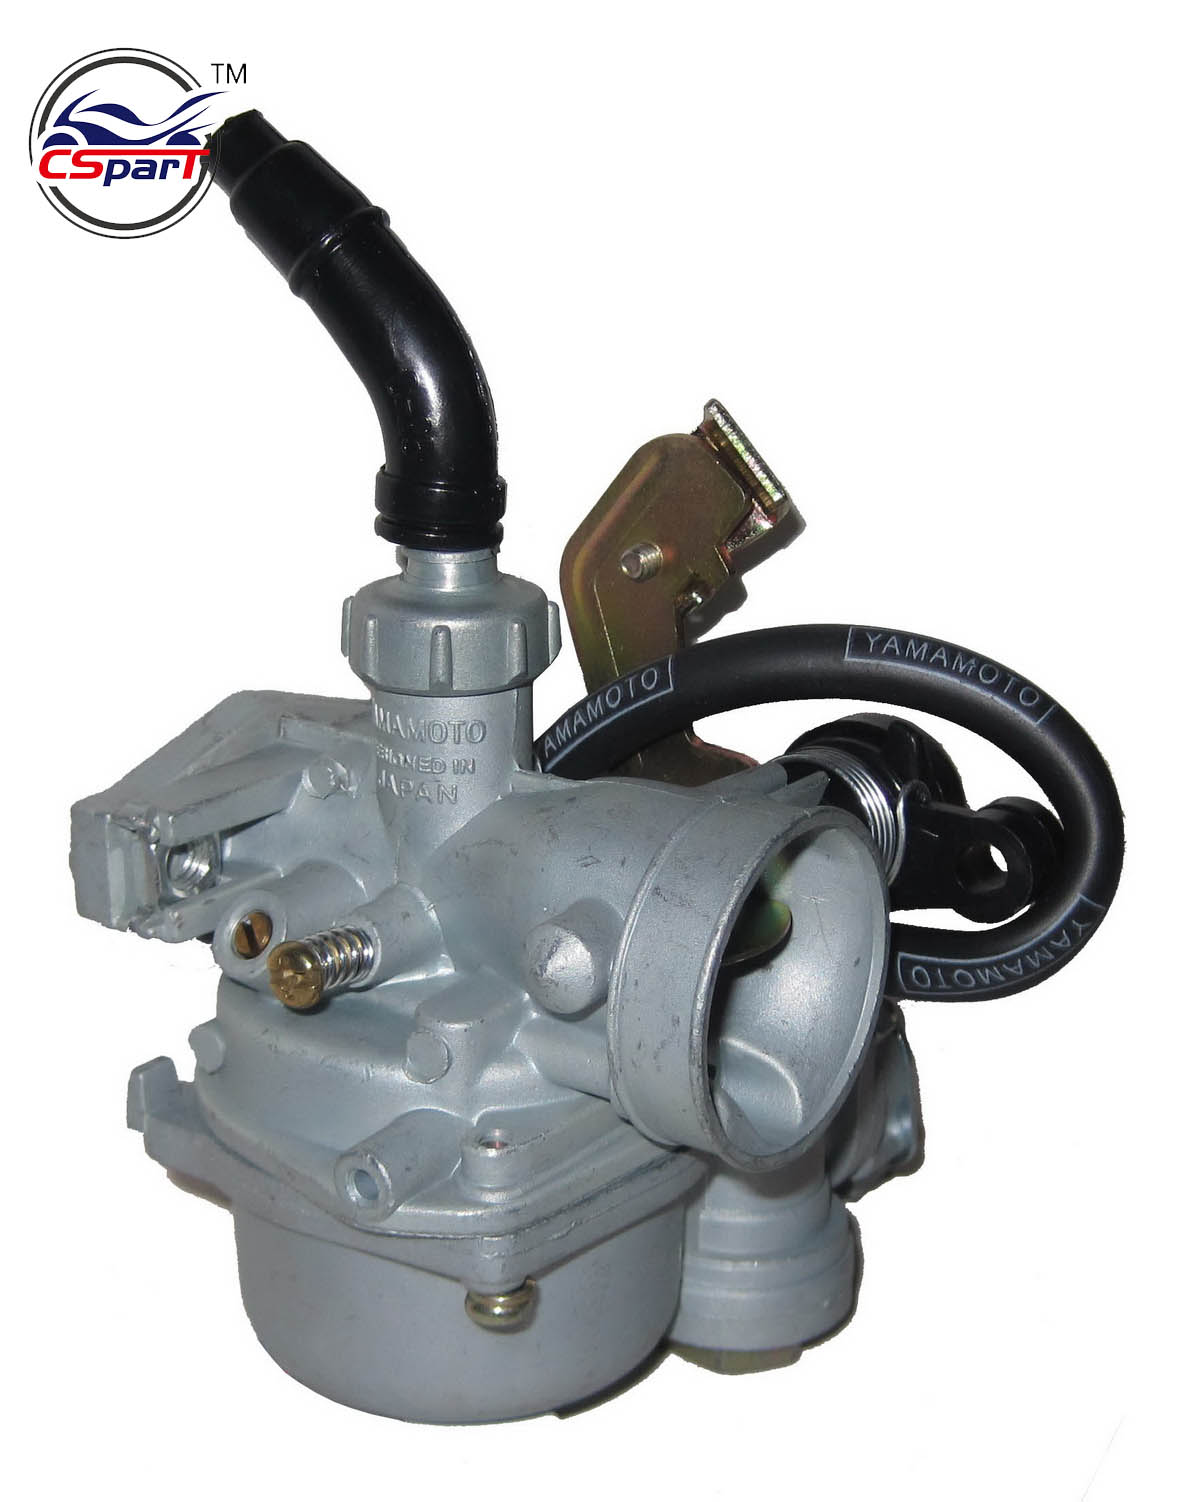 US $24 51 5% OFF 17mm PZ17 Carb Carburetor Cable Chock Fuel Value For Honda  TRX 70 ATC70 CT70 C70 FOURTRAX Dirt Pit Bike ATV Quad Parts-in Carburetor